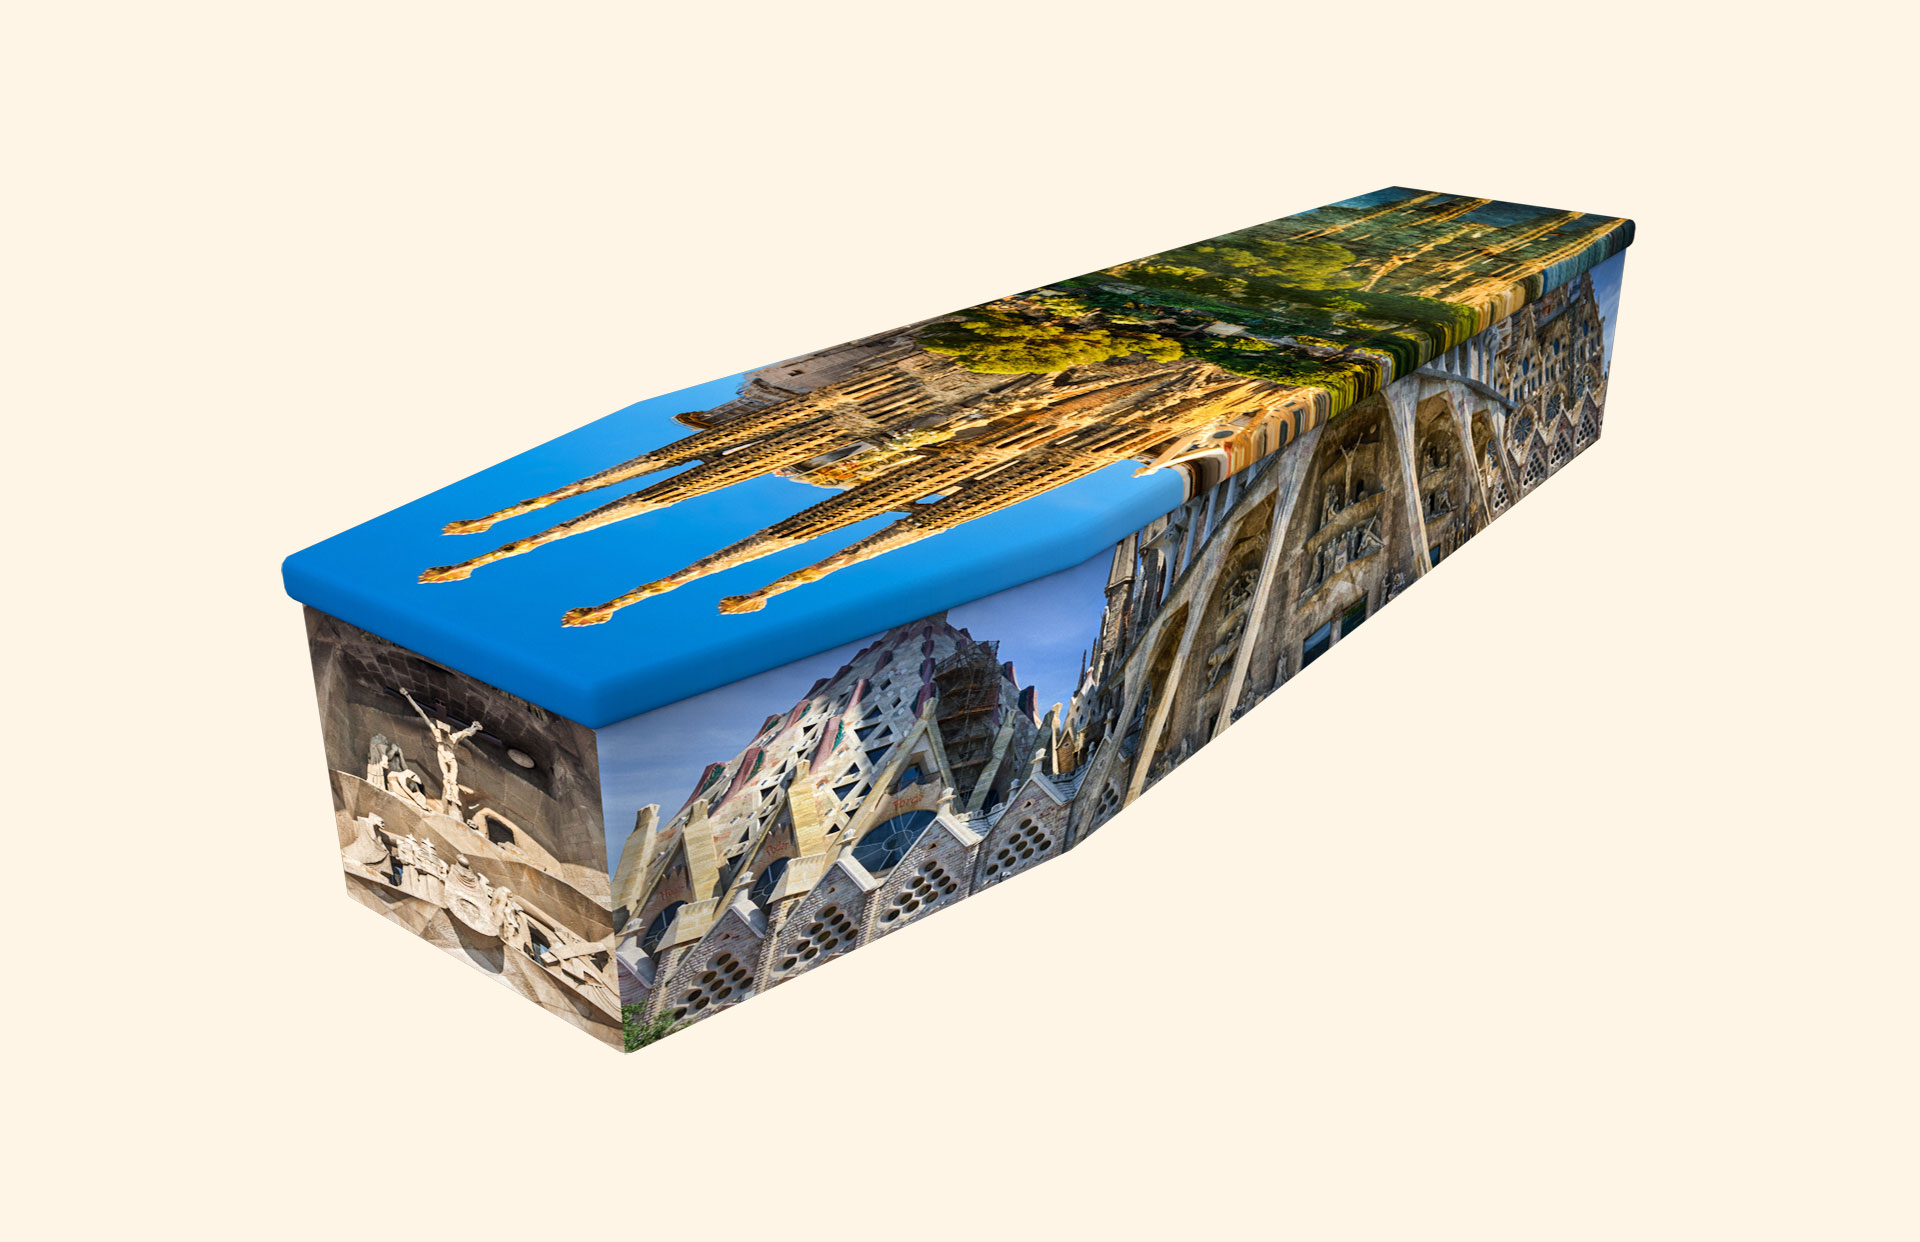 Sagrada Familia cardboard coffin